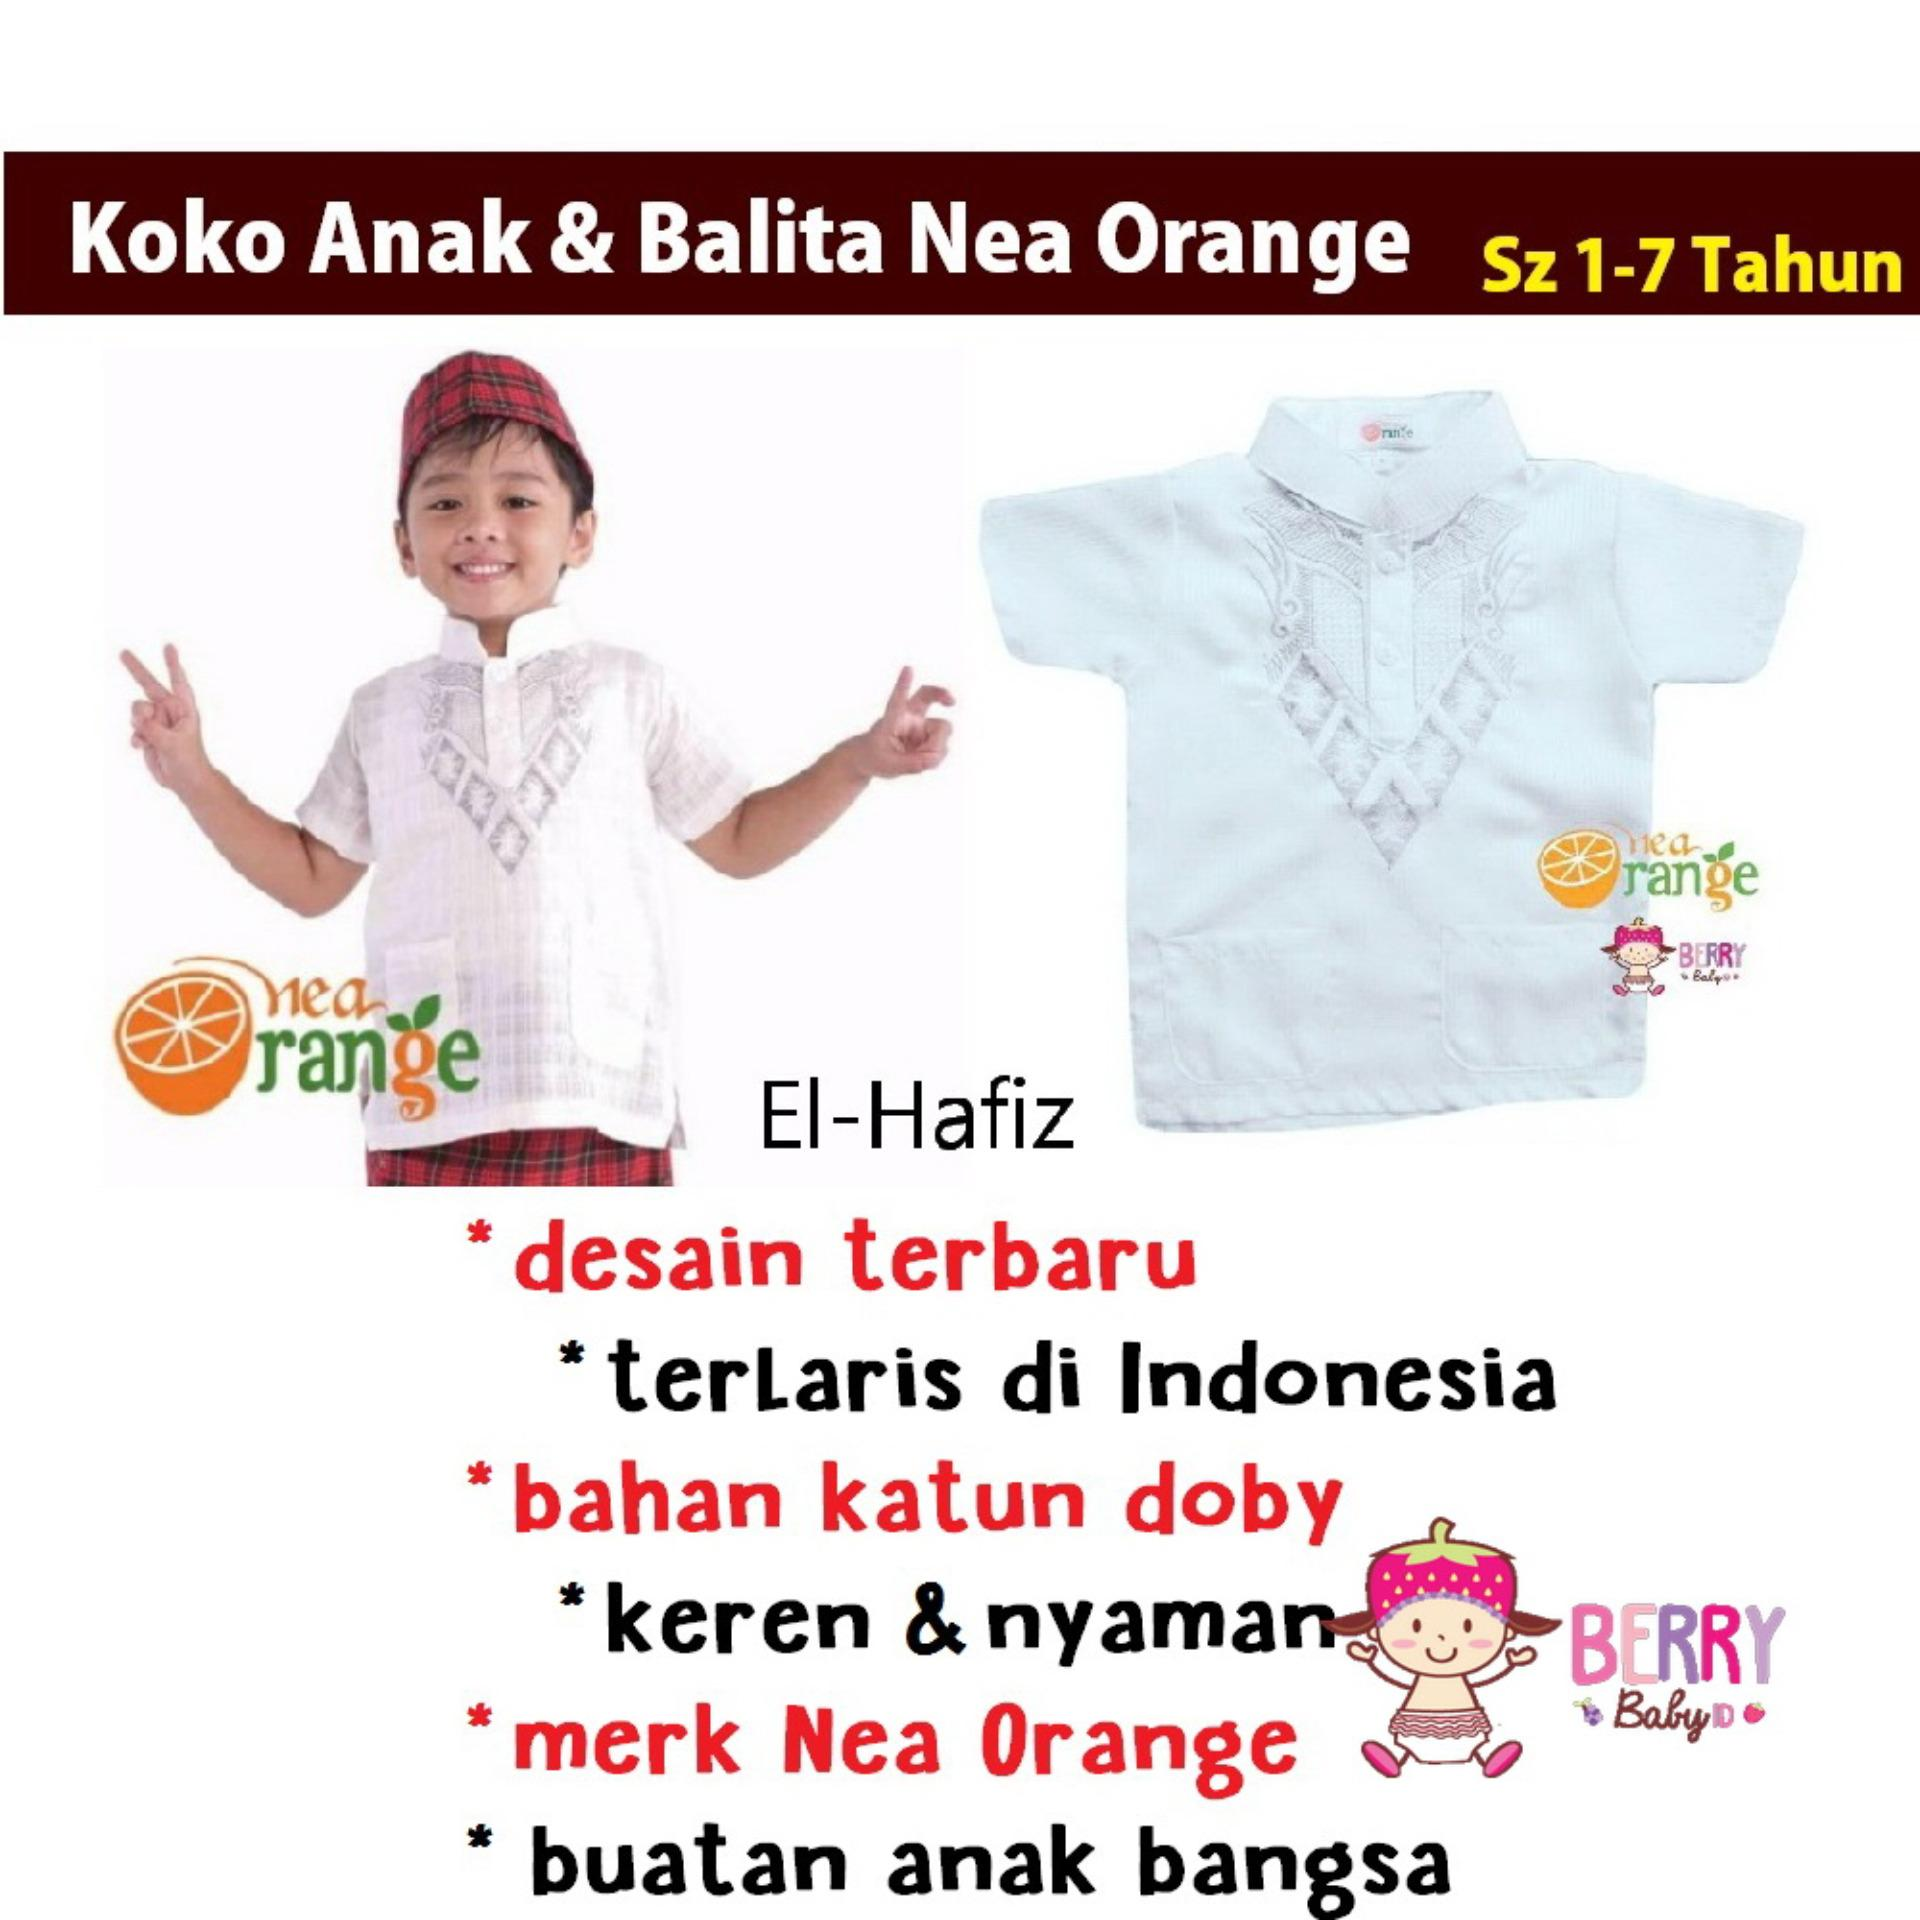 Harga Nea Orange Baju Koko El Hafiz Anak Balita Lebaran 2017 Di Jawa Barat